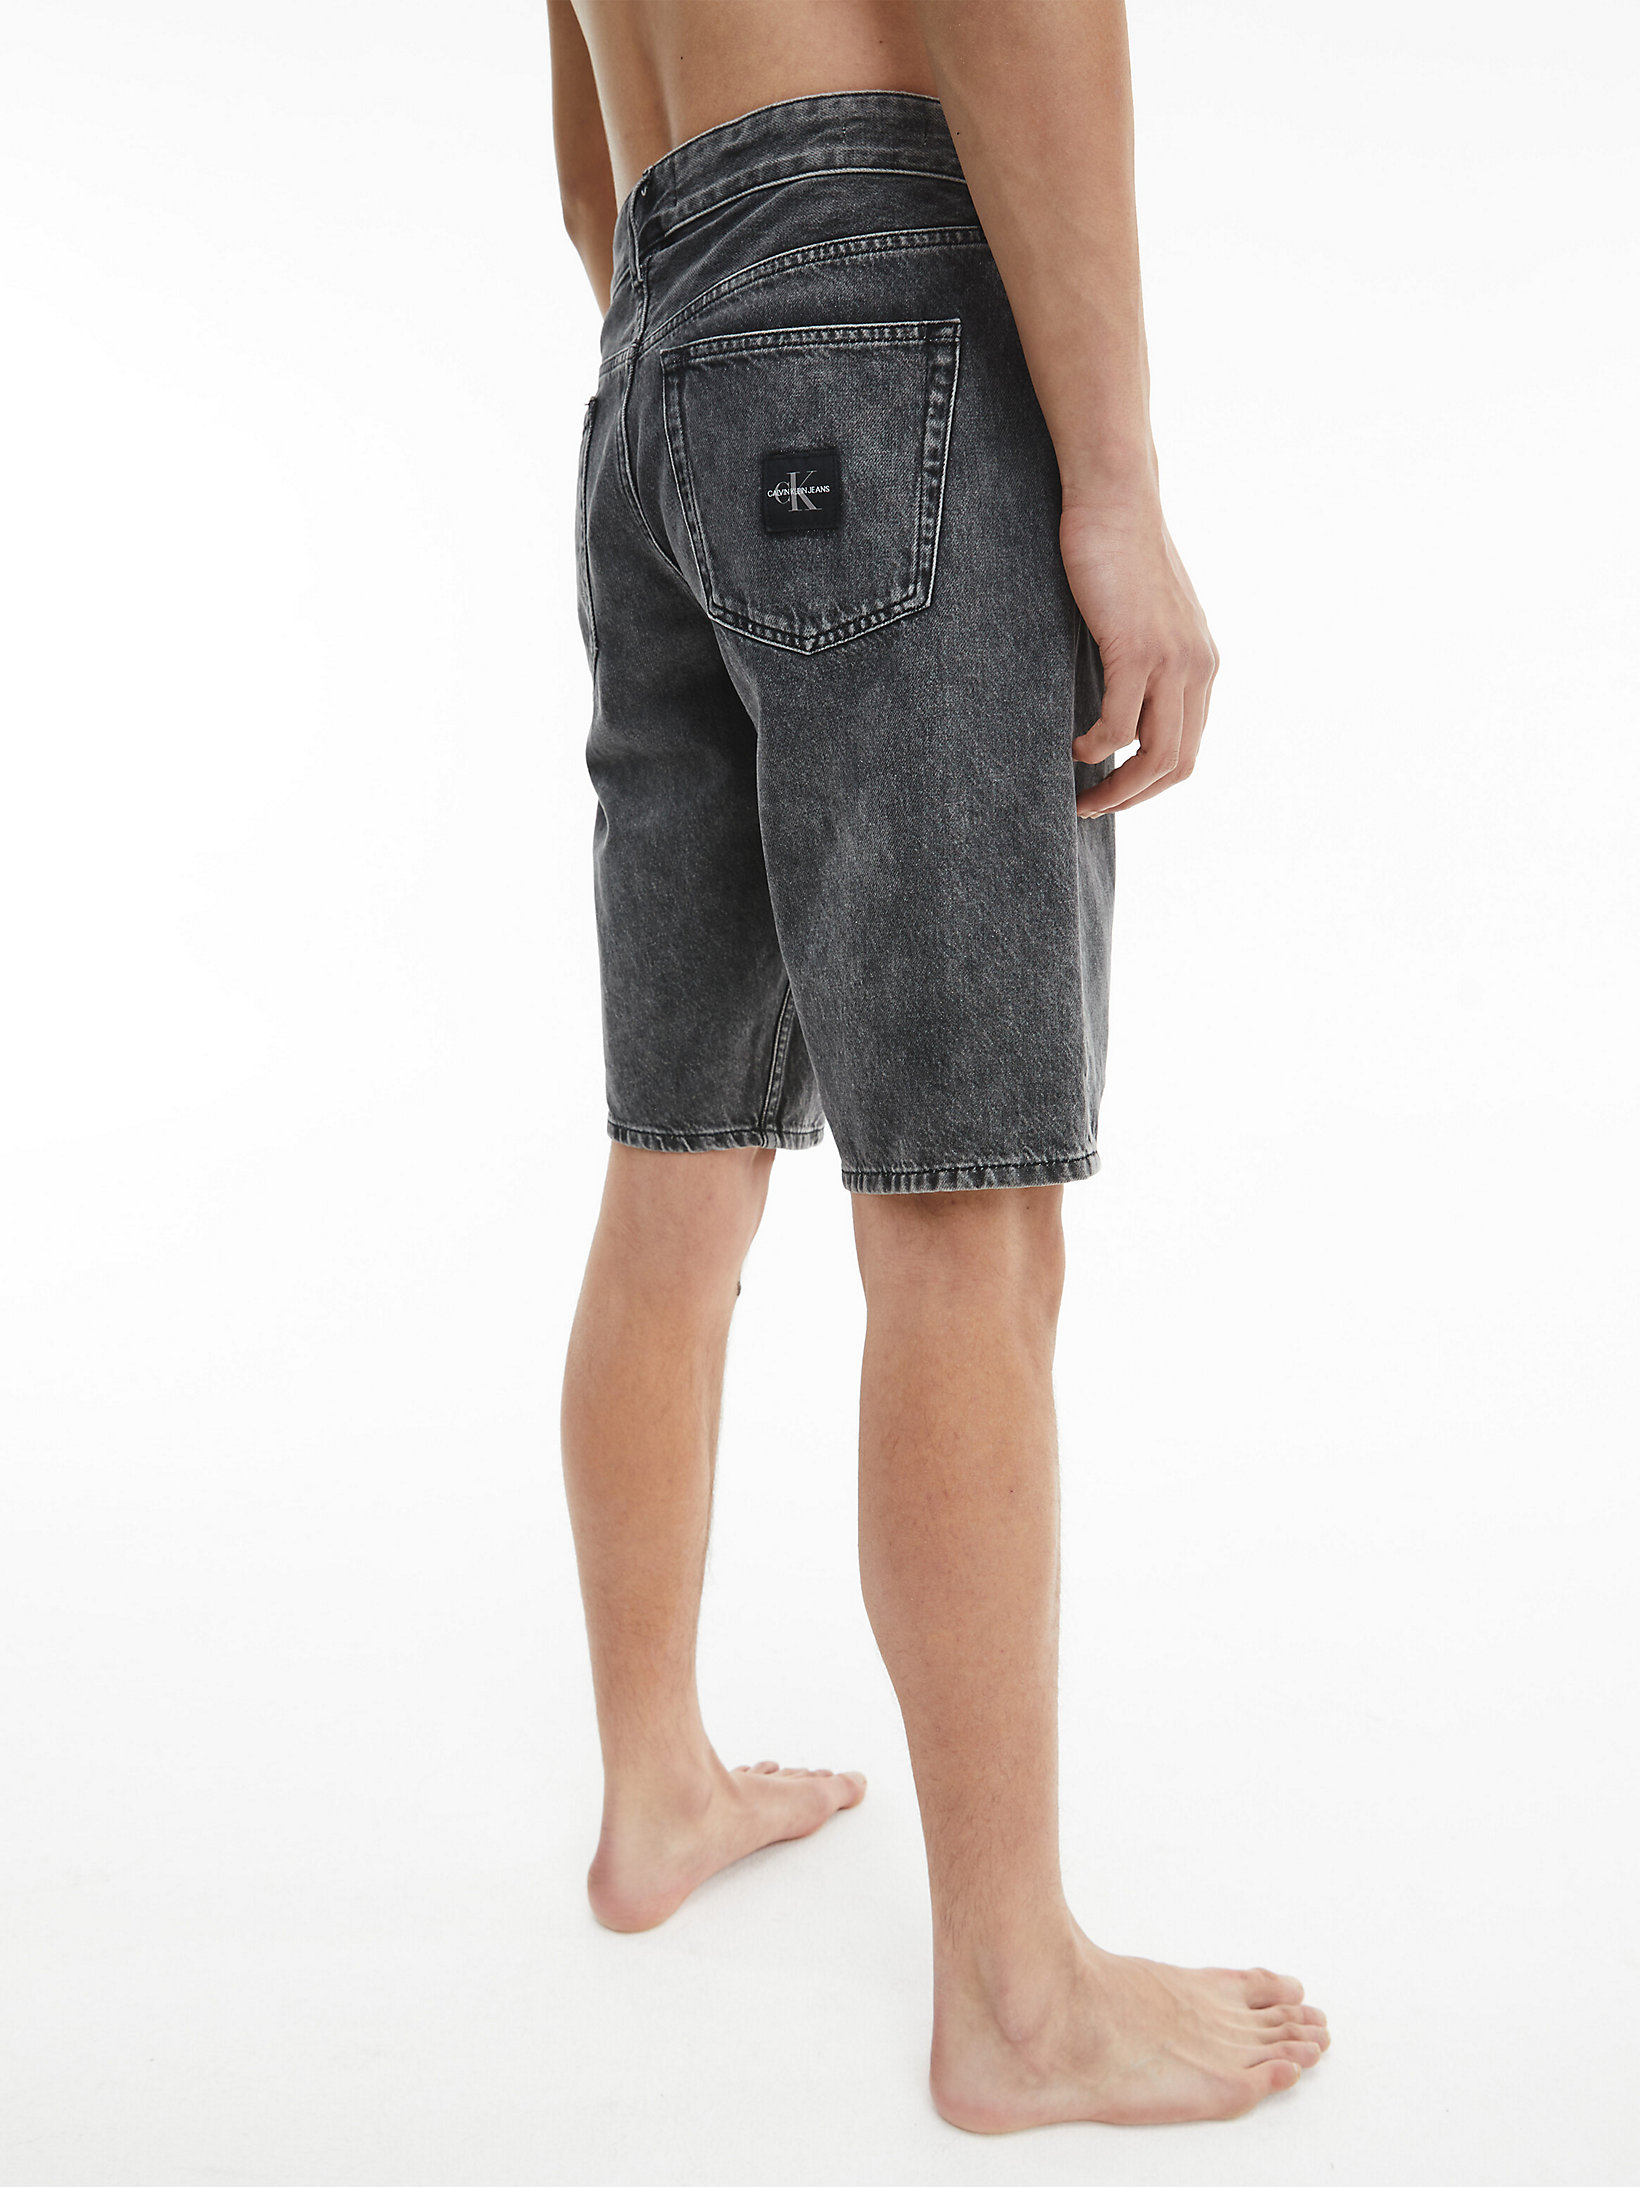 Calvin Klein Denim Shorts Denim Black